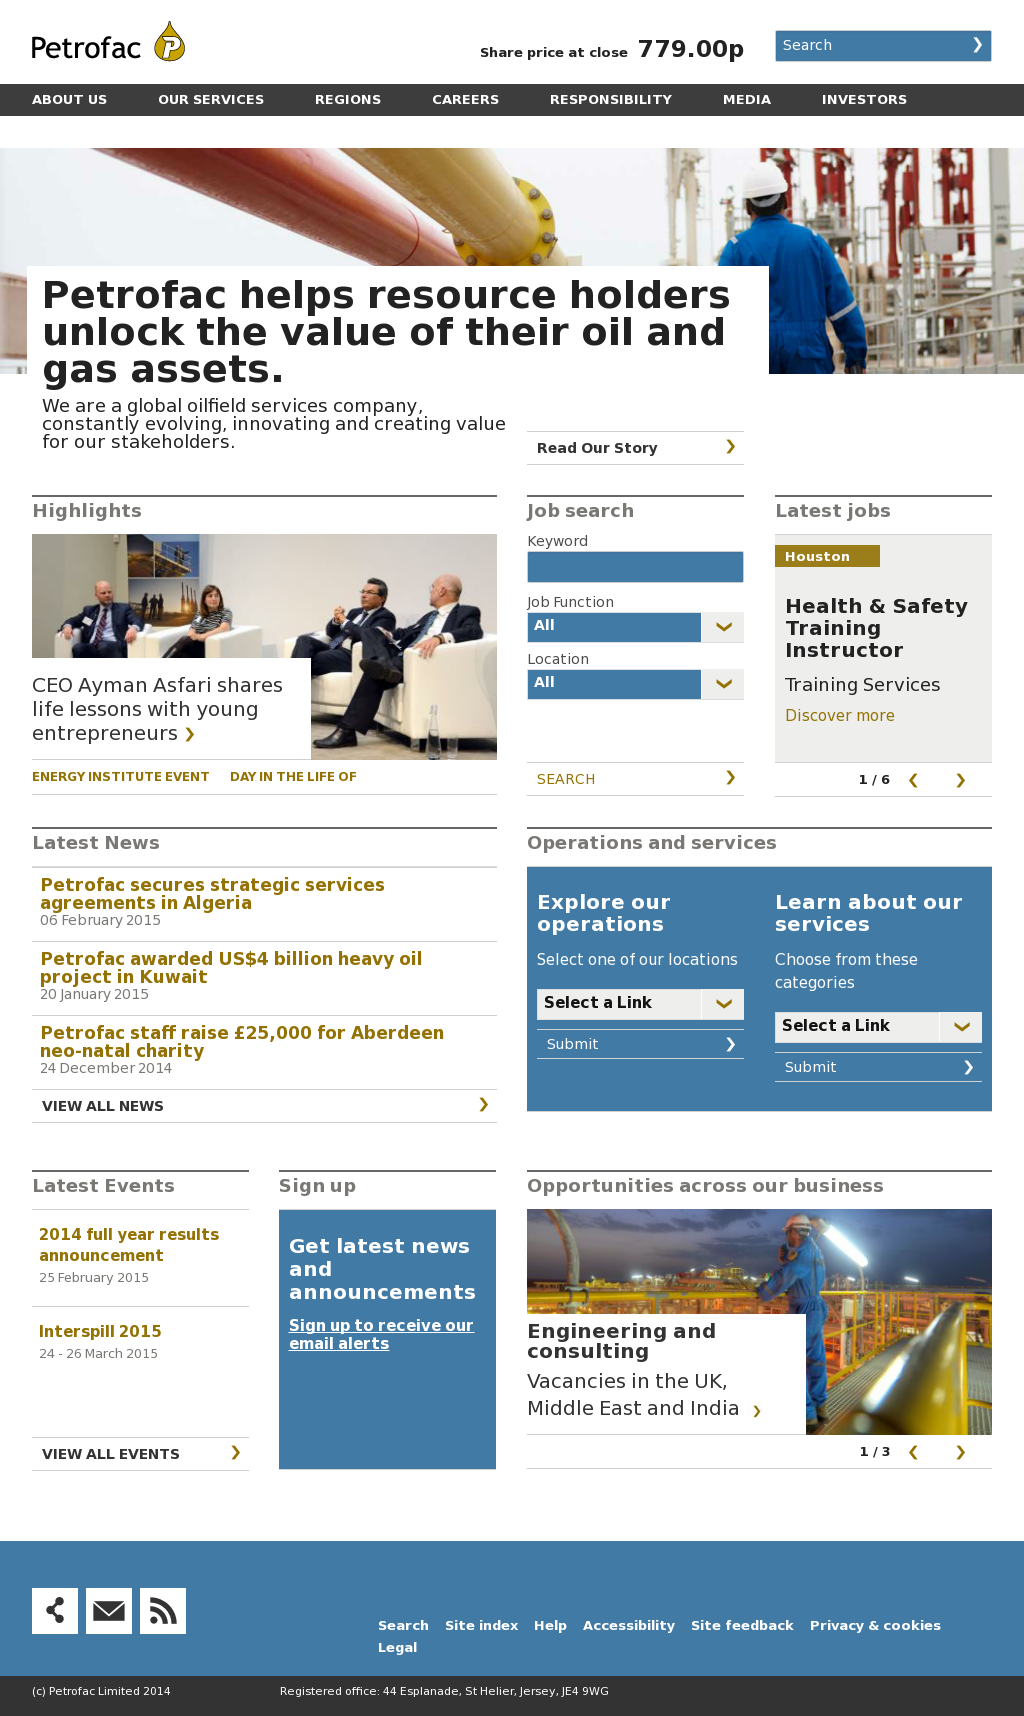 Petrofac Competitors, Revenue and Employees - Owler Company Profile